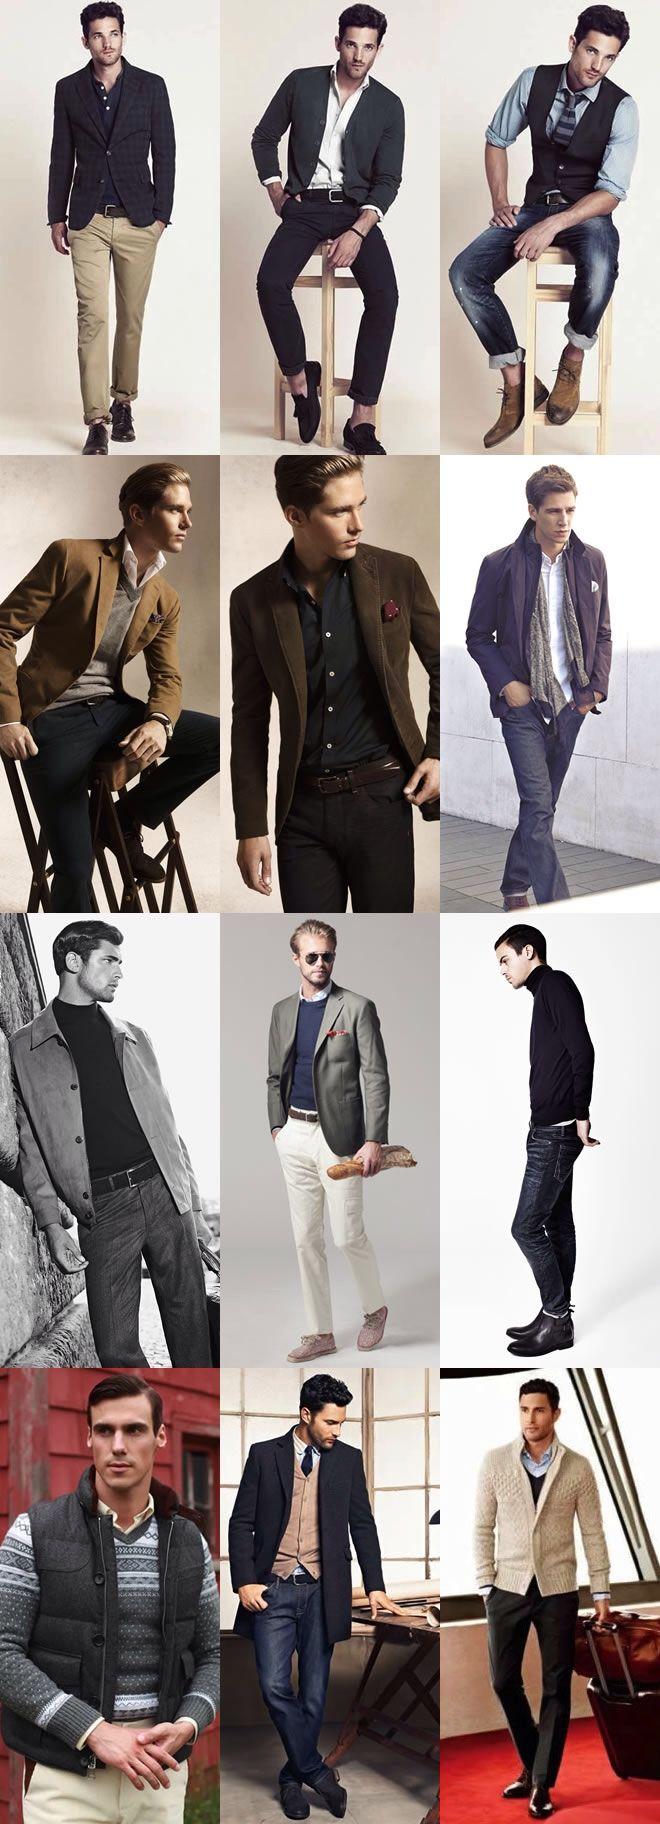 65 besten leather jeans bilder auf pinterest leder lederhosen und m nner. Black Bedroom Furniture Sets. Home Design Ideas